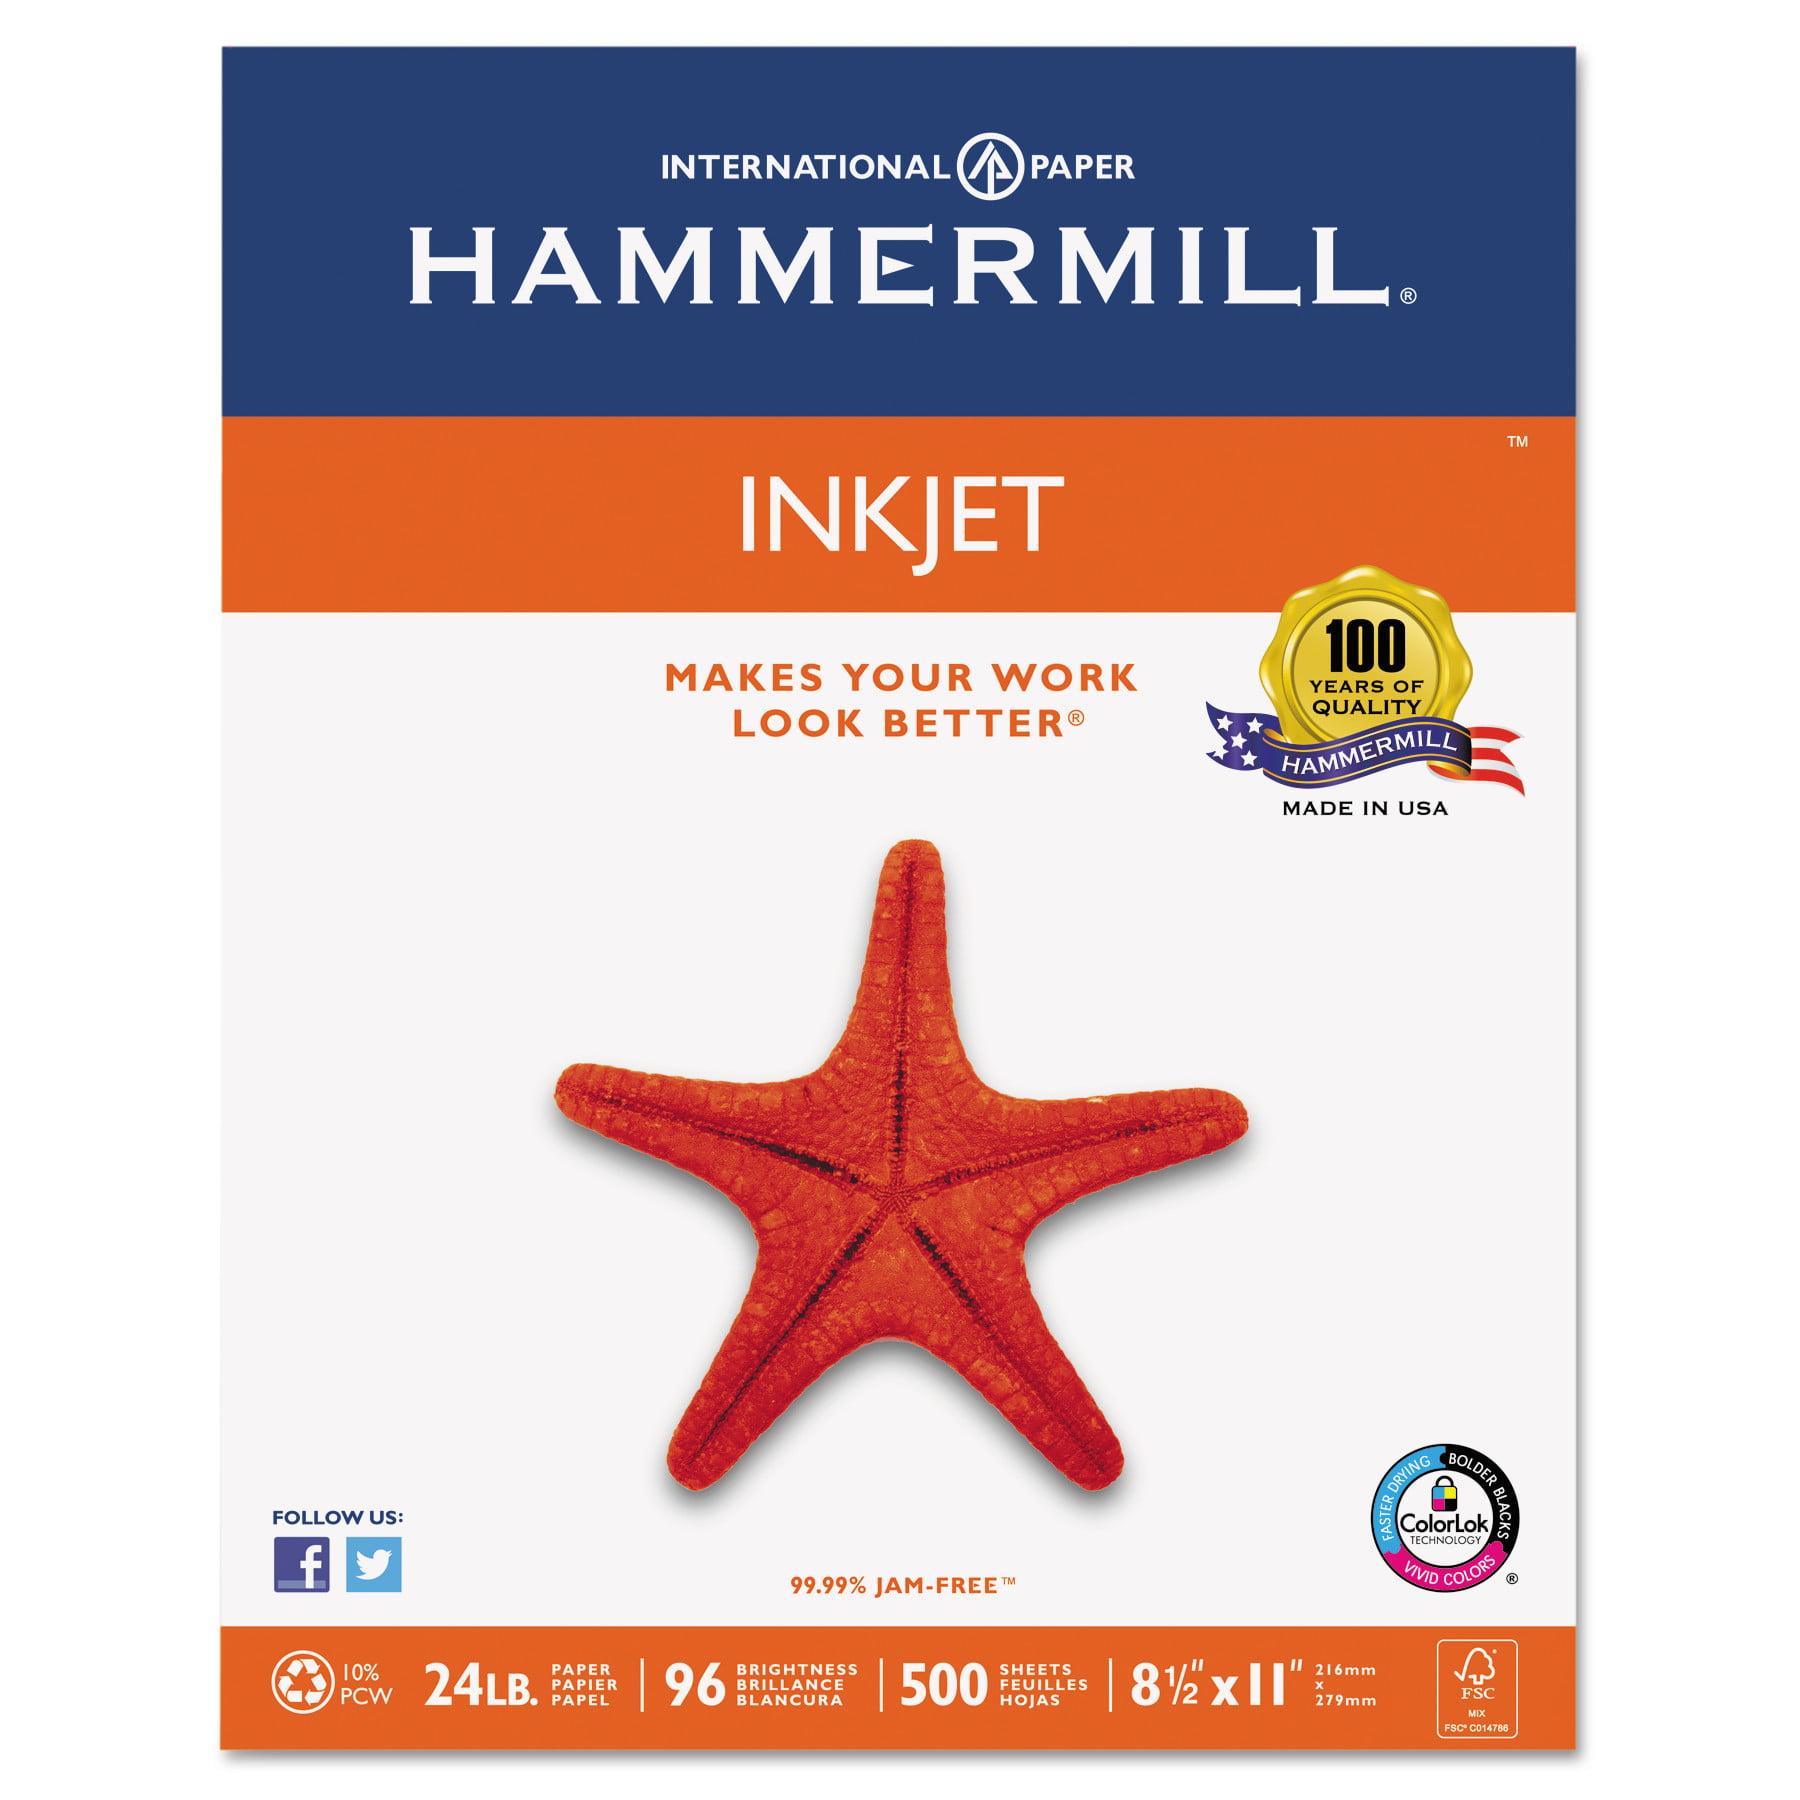 Hammermill Inkjet Paper, 8.5x11 In, 96 Bright, 24lb, 500 Sheets/Ream